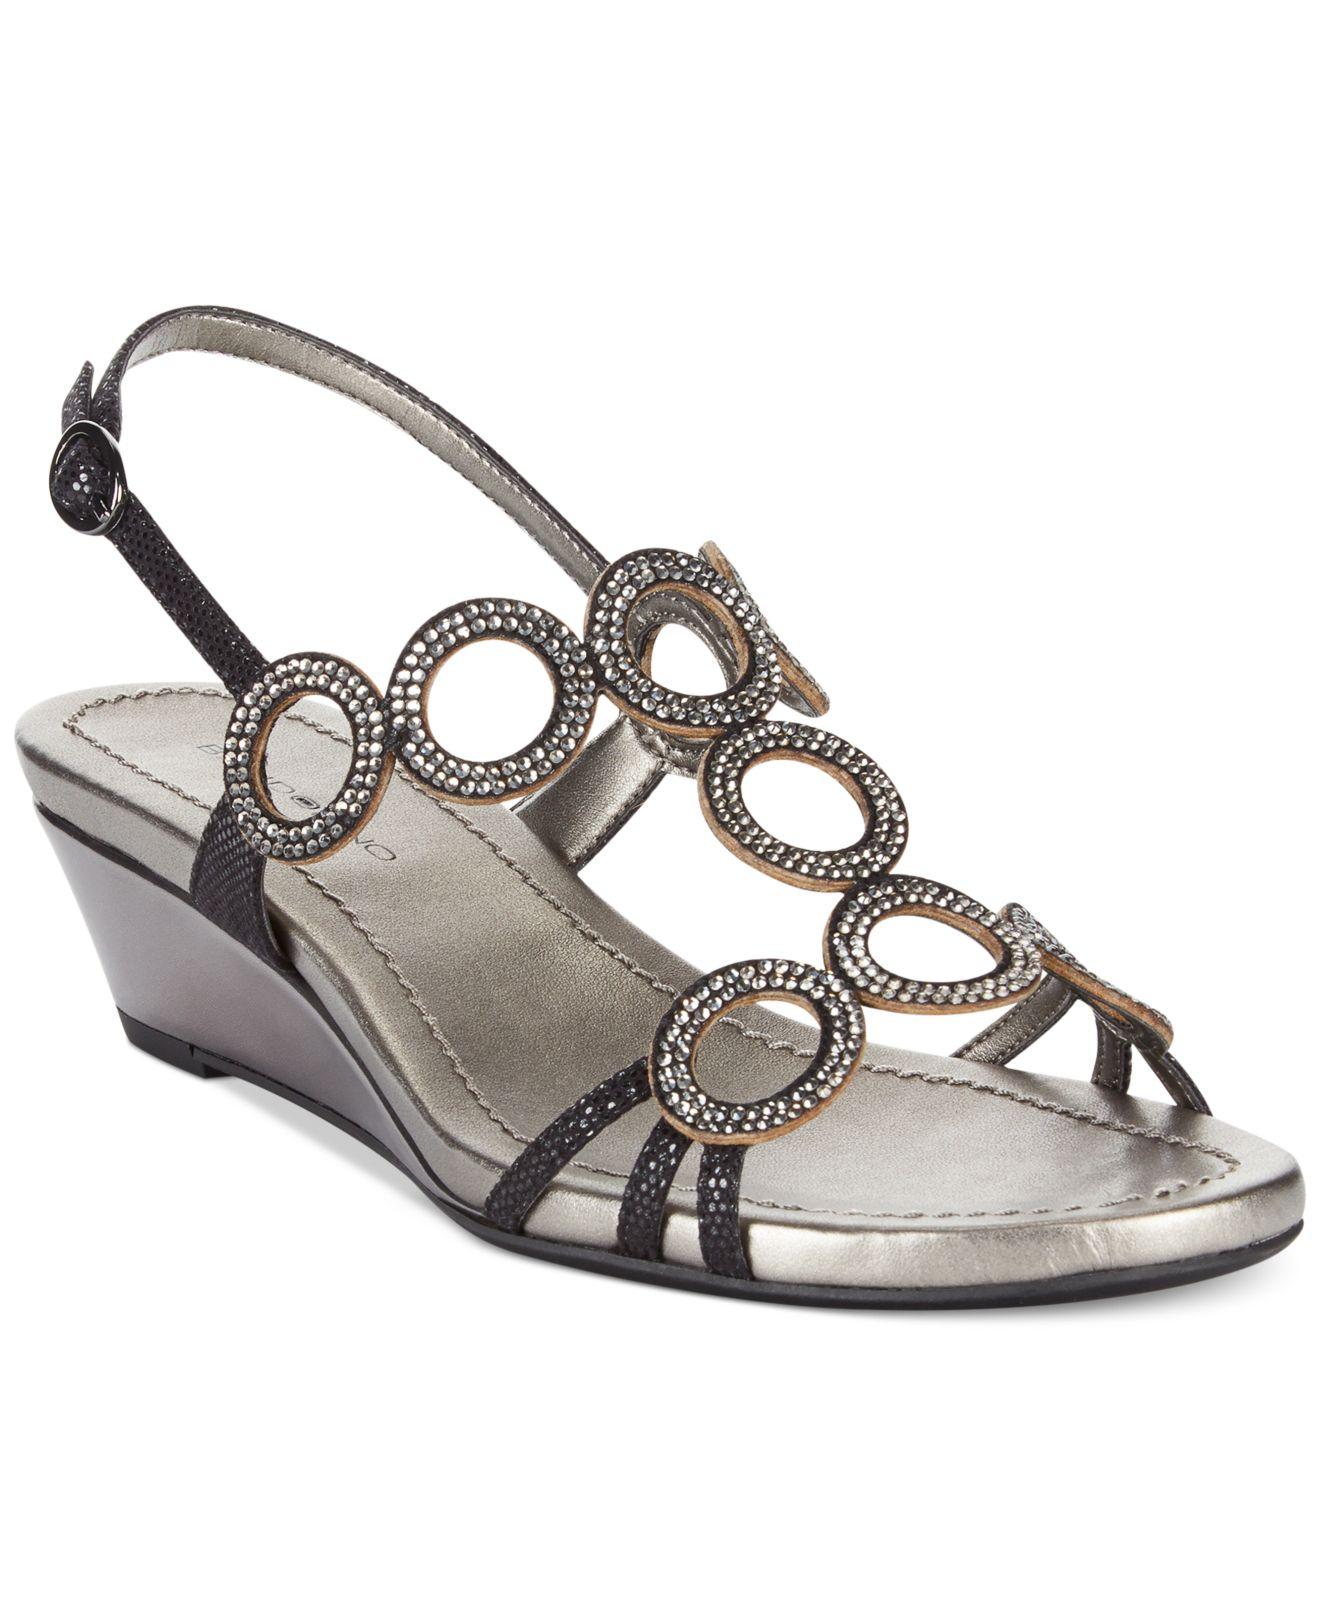 592fe08c2 Lyst - Bandolino Gia Evening Wedge Sandals in Black